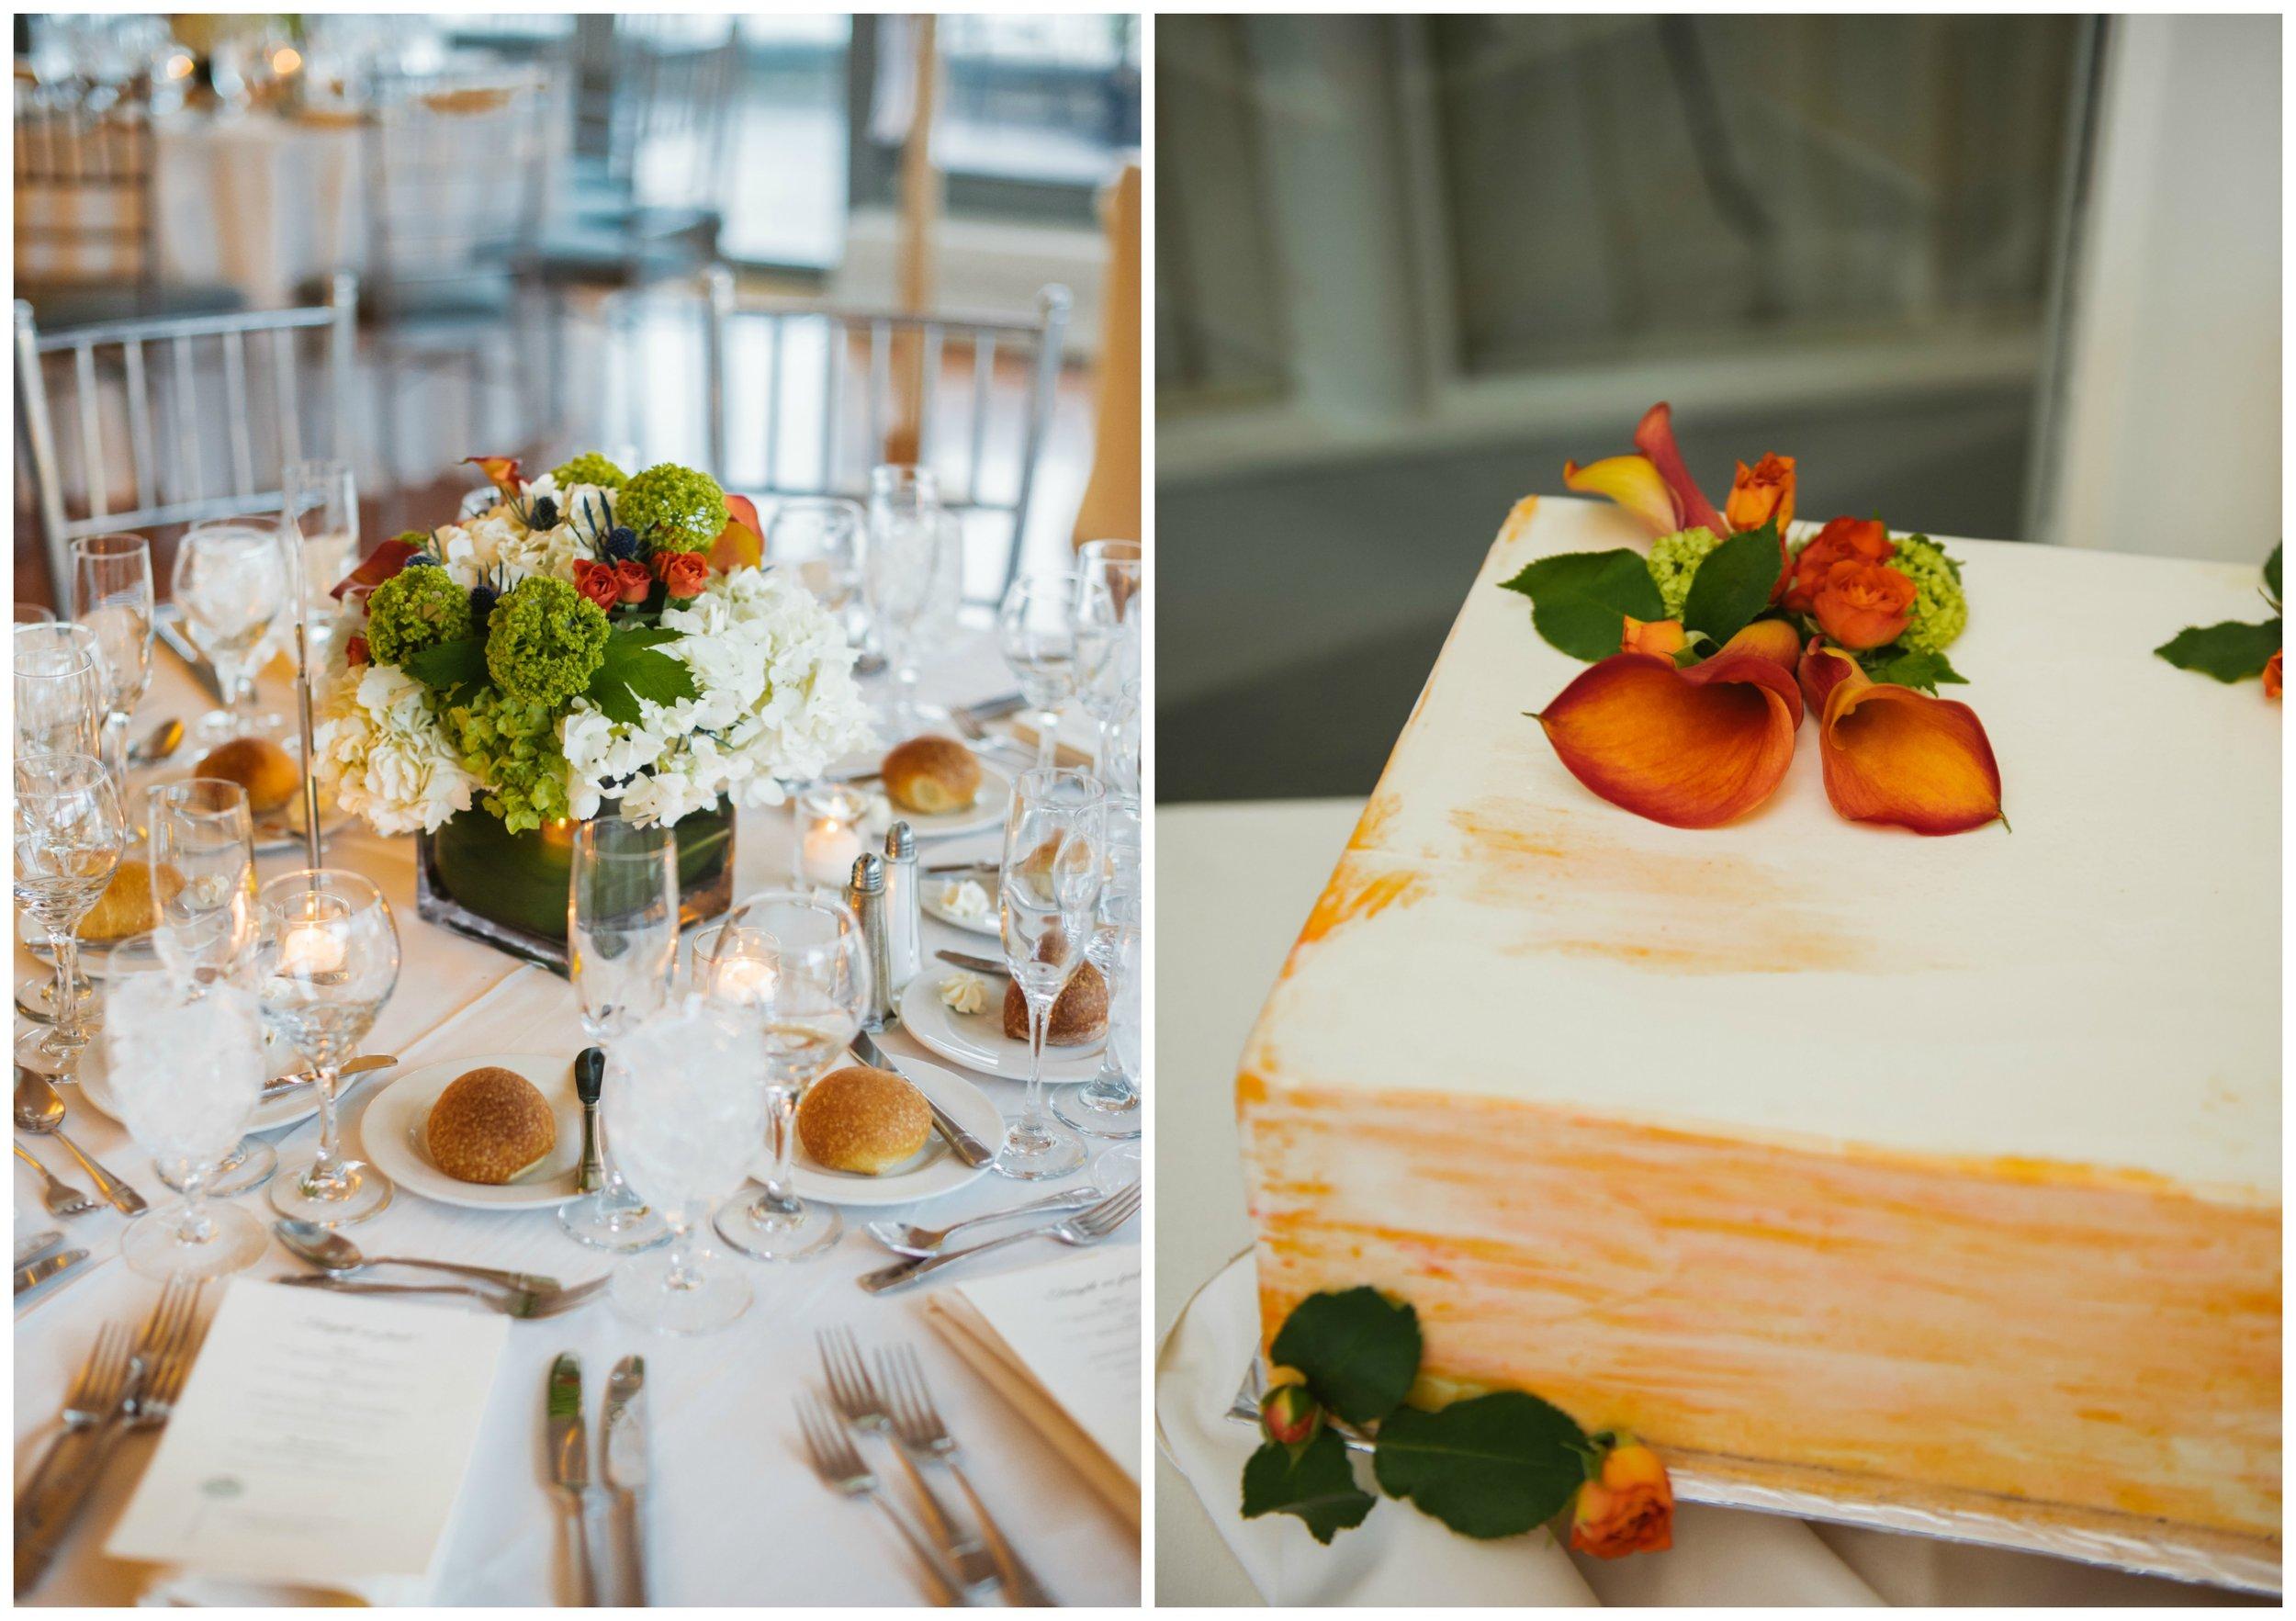 BATTERY PARK WEDDING - NYC INTIMATE WEDDING PHOTOGRAPHER - CHI-CHI ARI 11.jpg